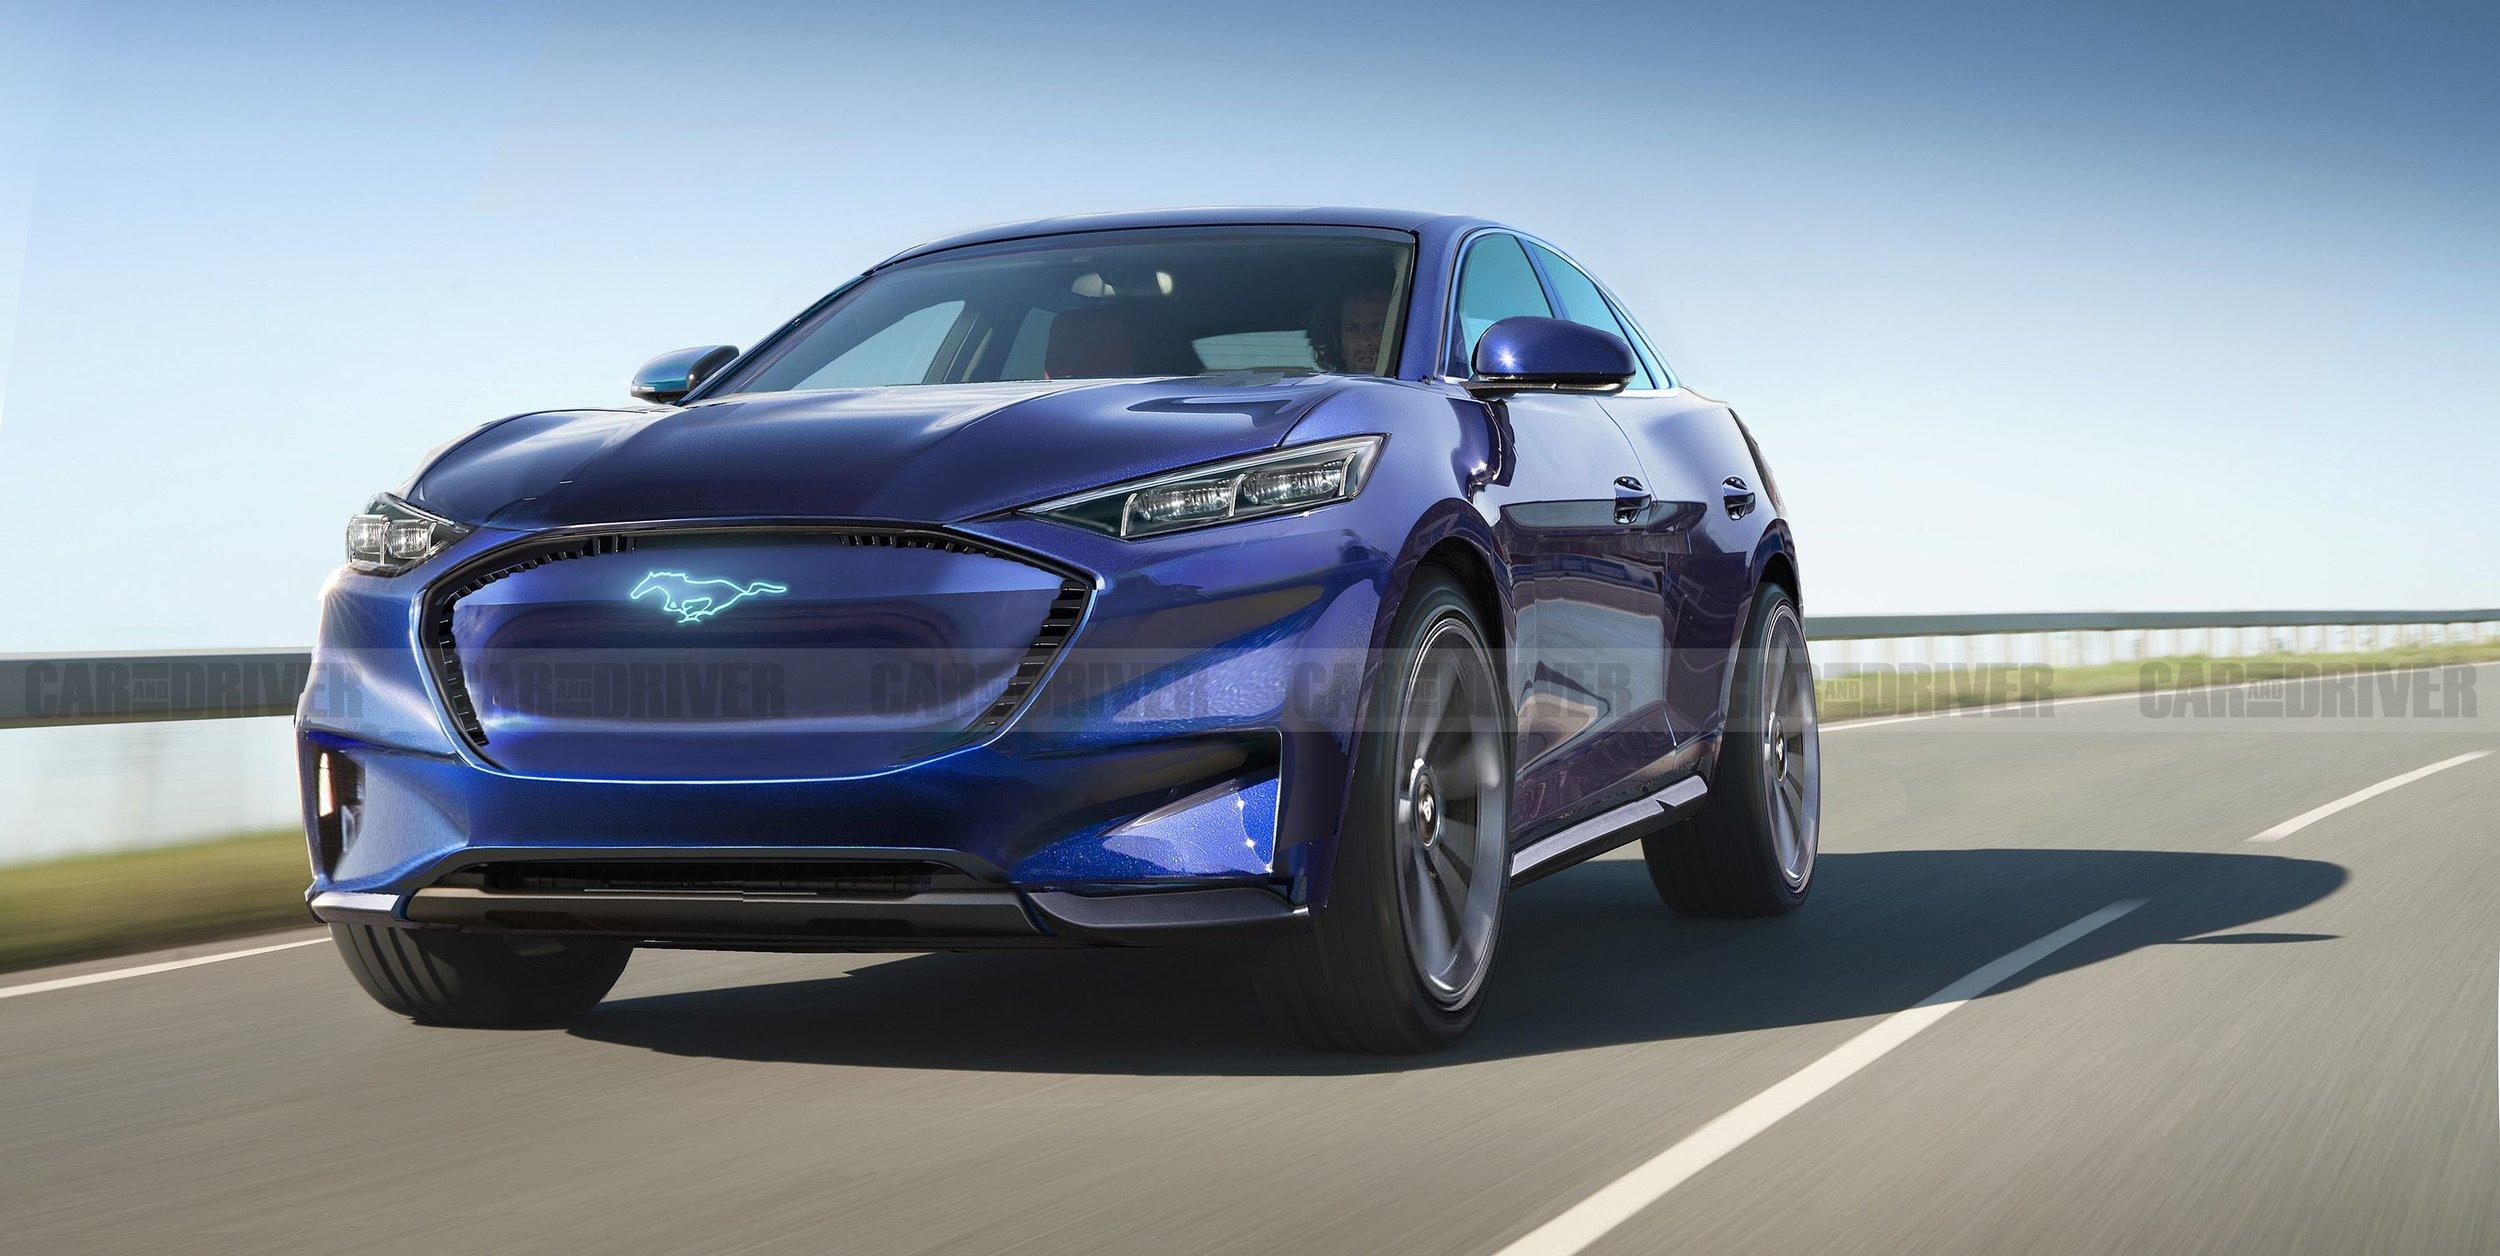 2021-ford-mach-e-illustration-radovan-varicak-car-and-driver.jpg